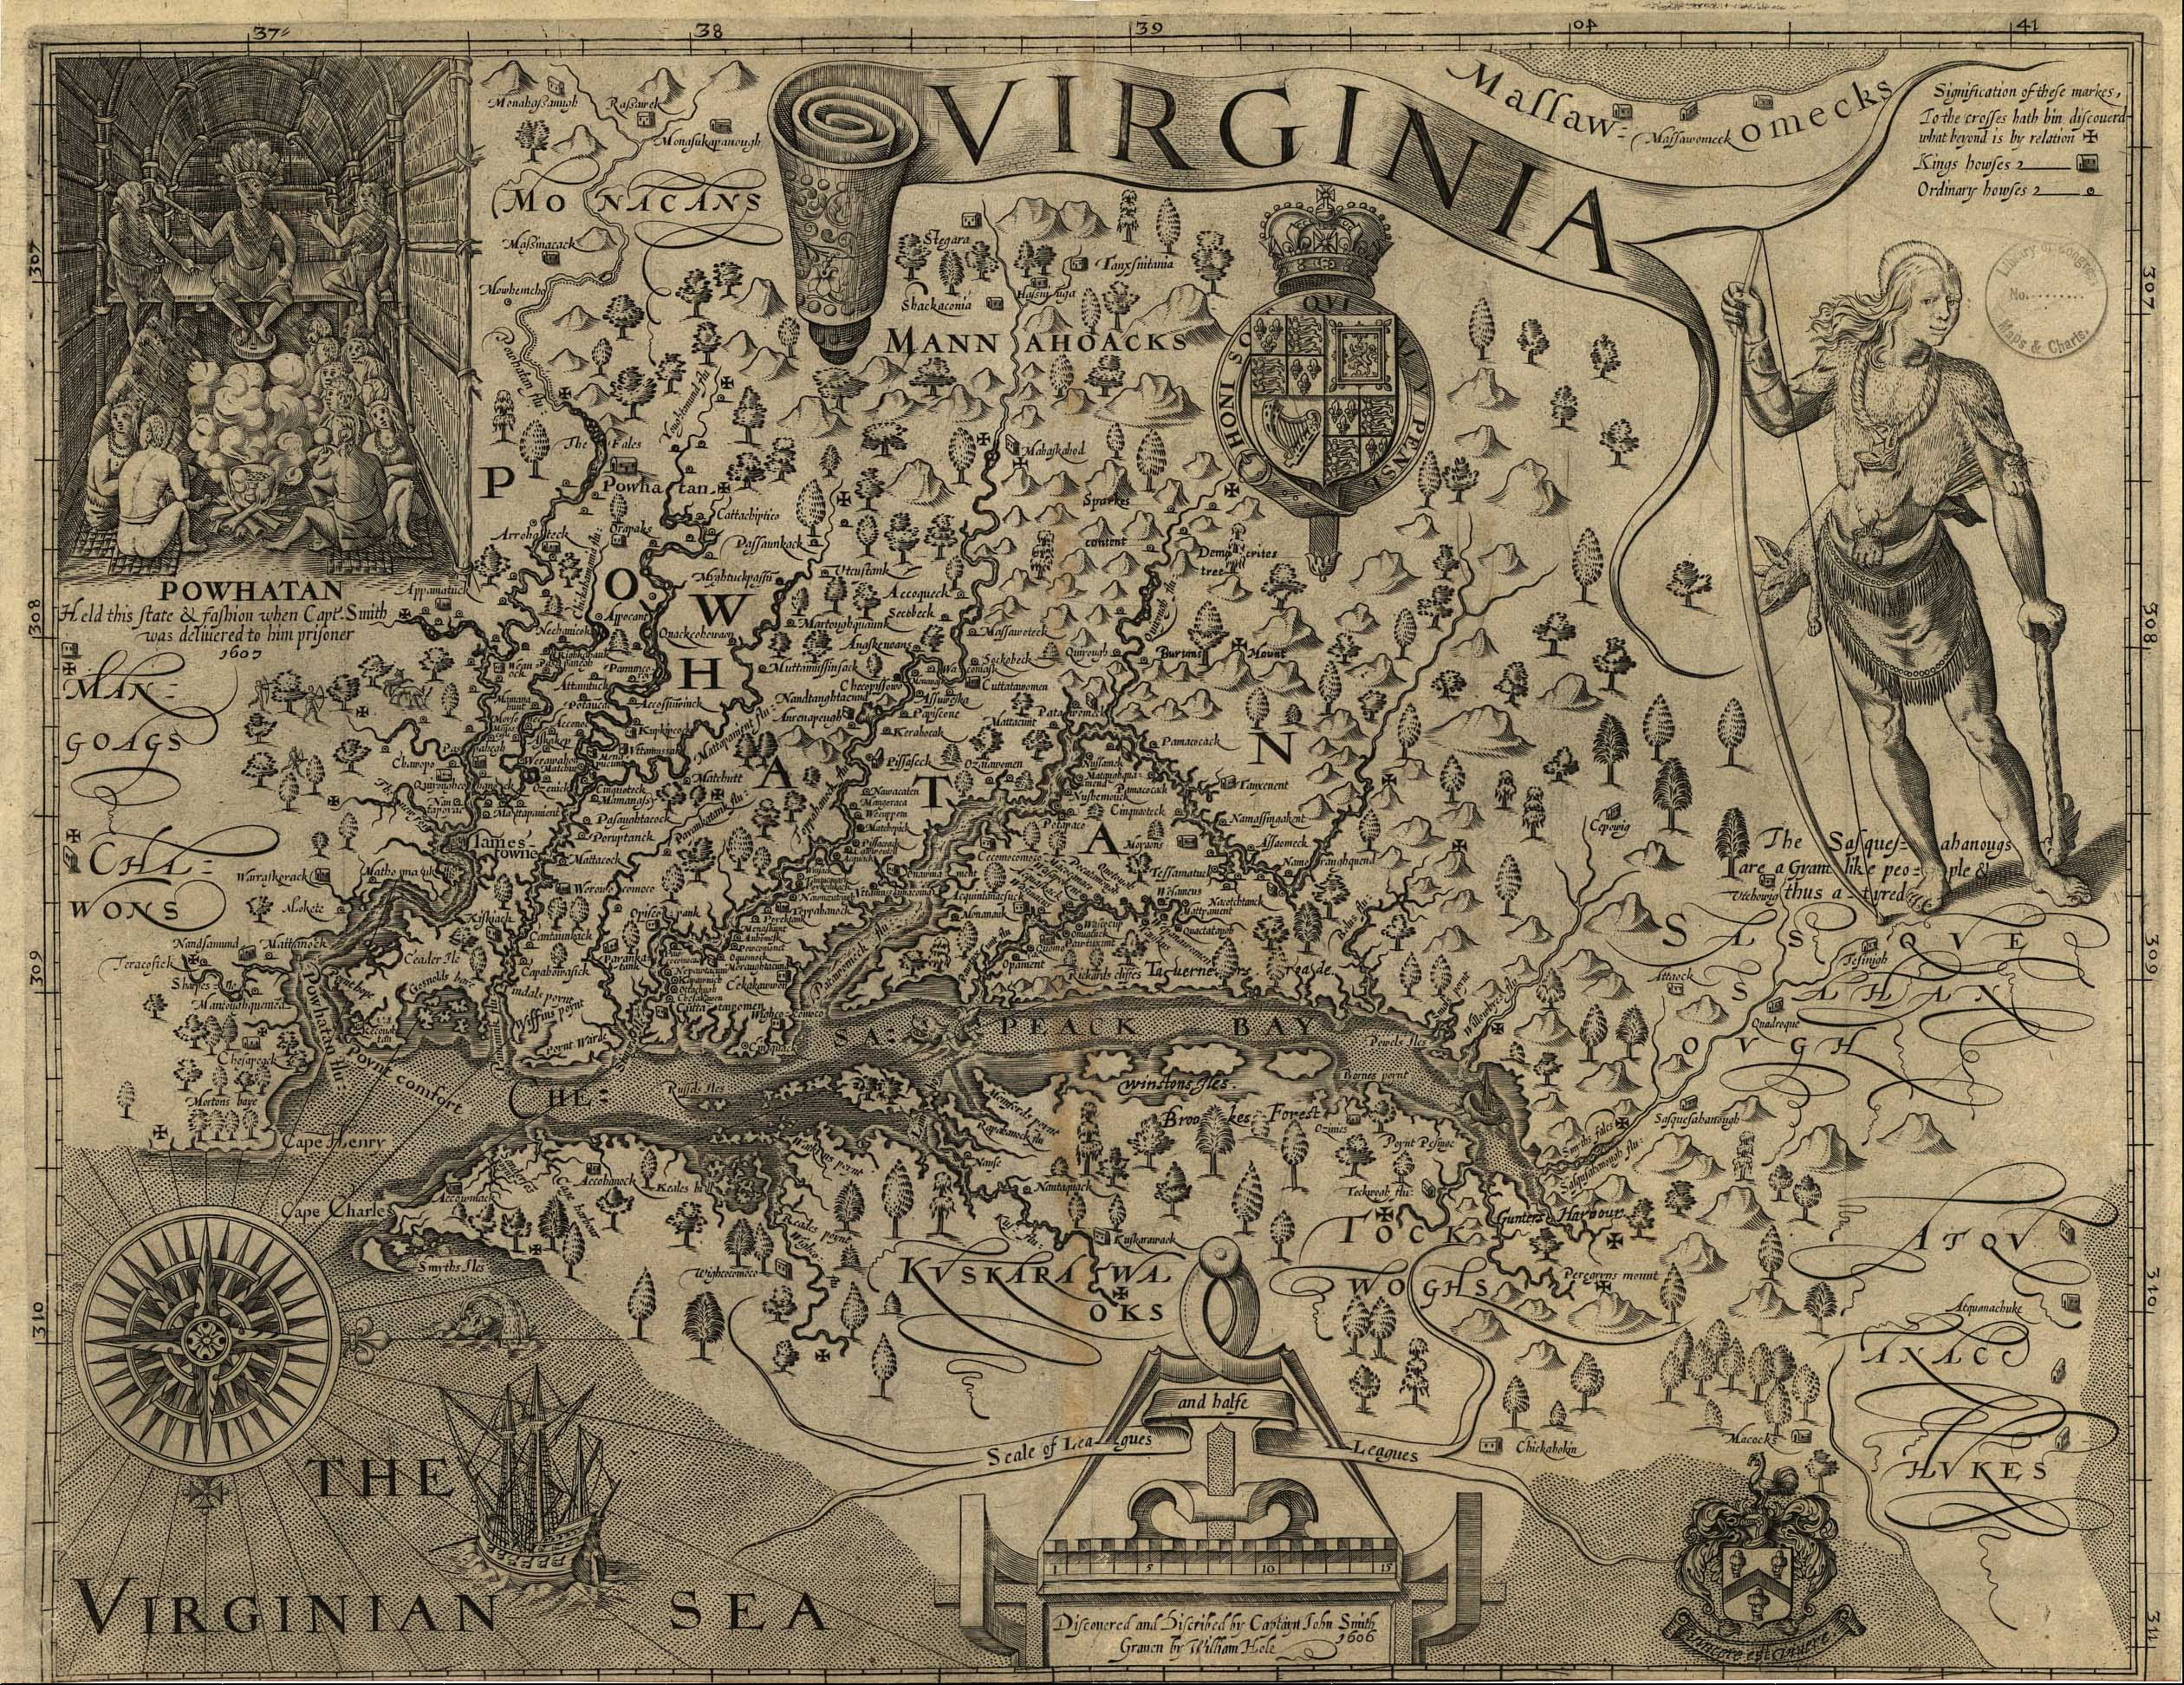 1612 map of Virginia